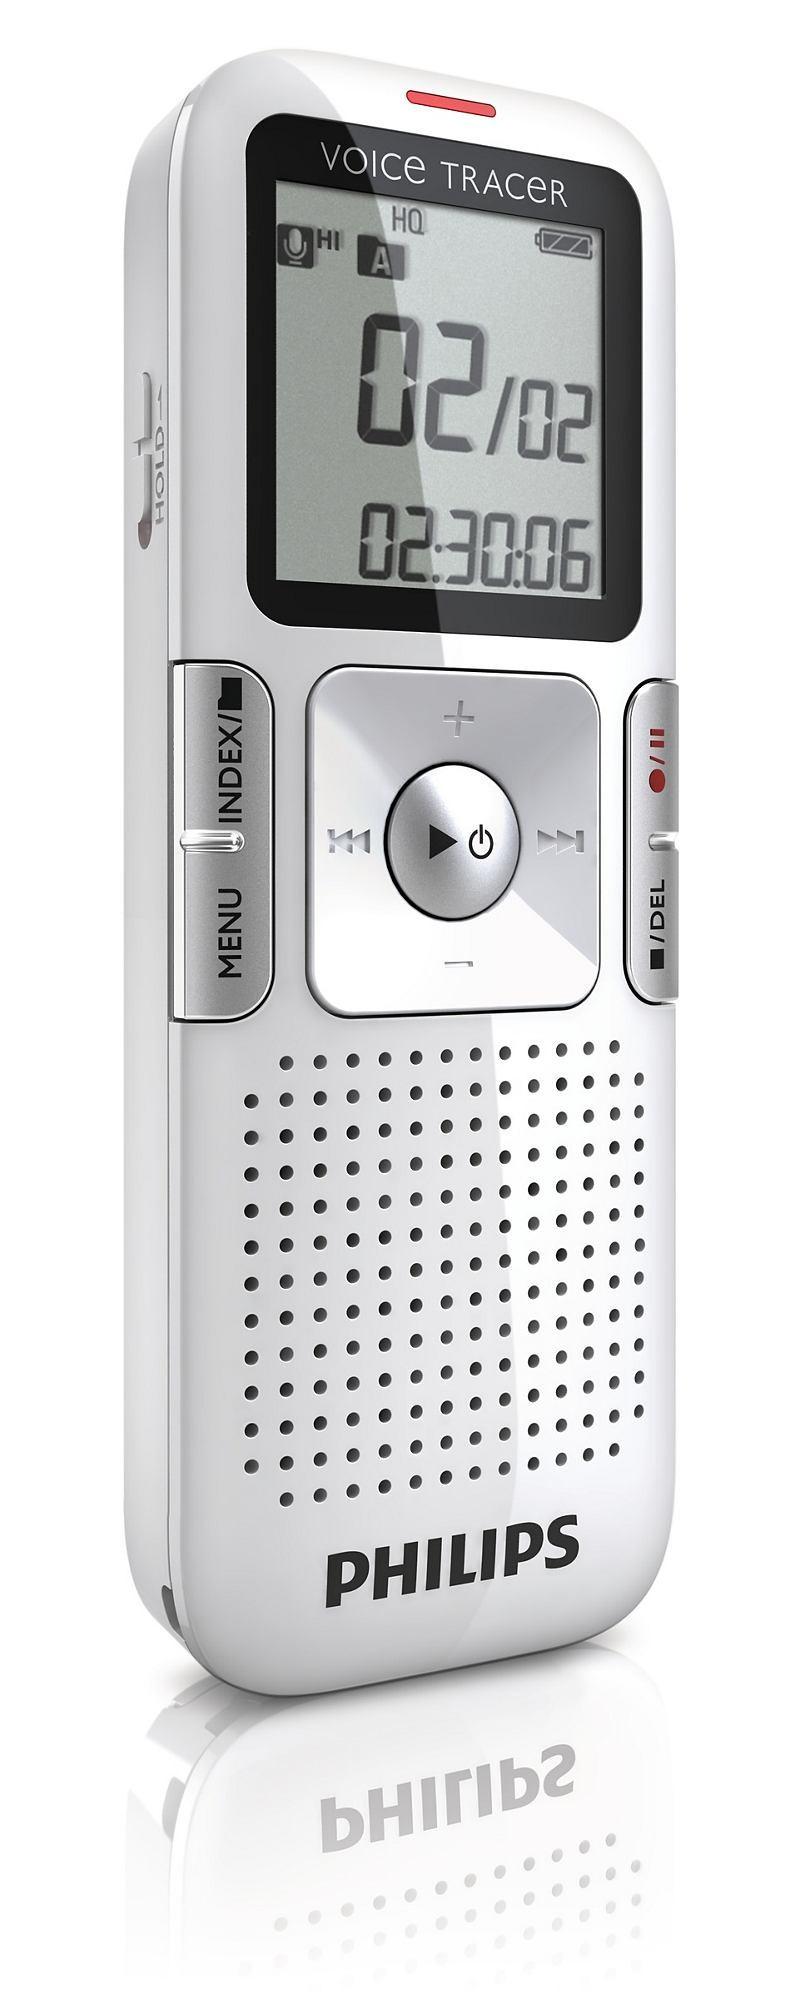 Philips LFH0615 Voice Tracer digital diktafon